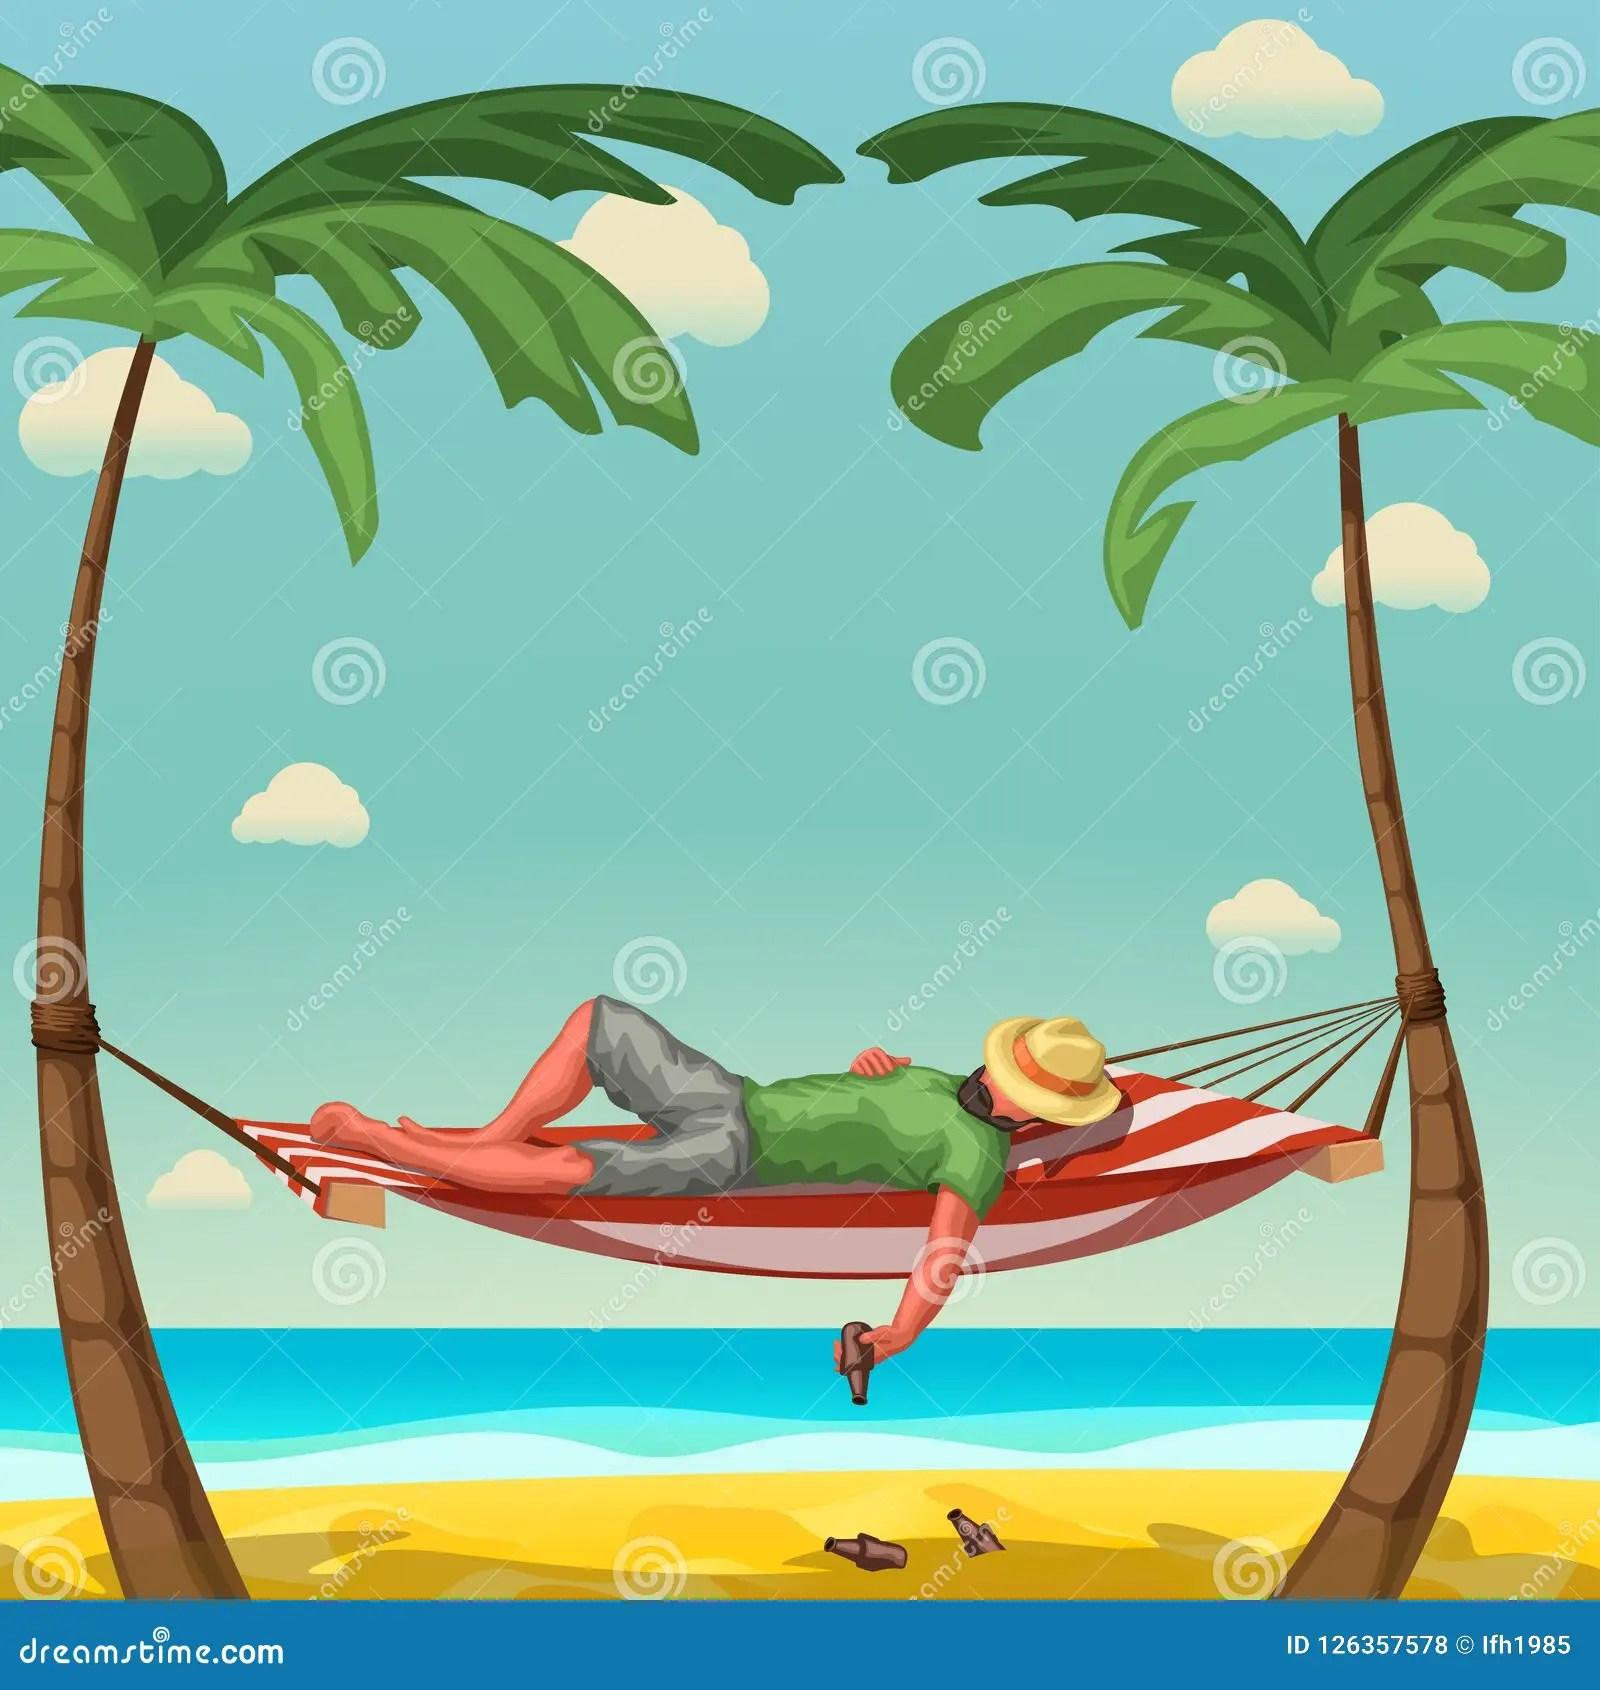 Man Sleep In Hammock Stock Vector Illustration Of Palm